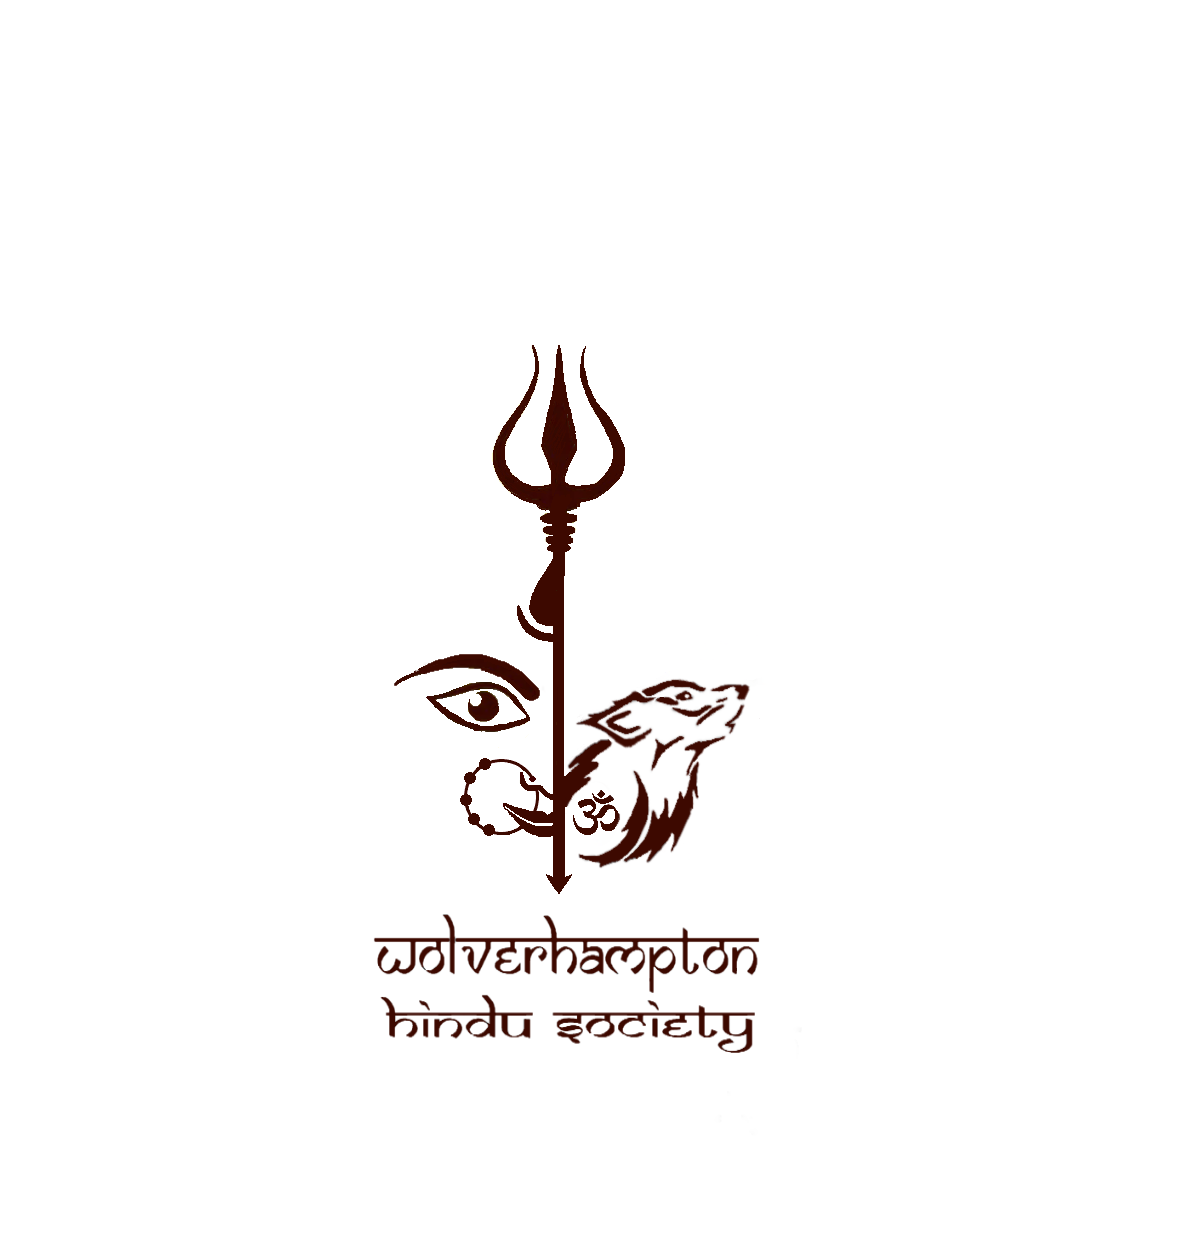 Wolverhampton Hindu Society